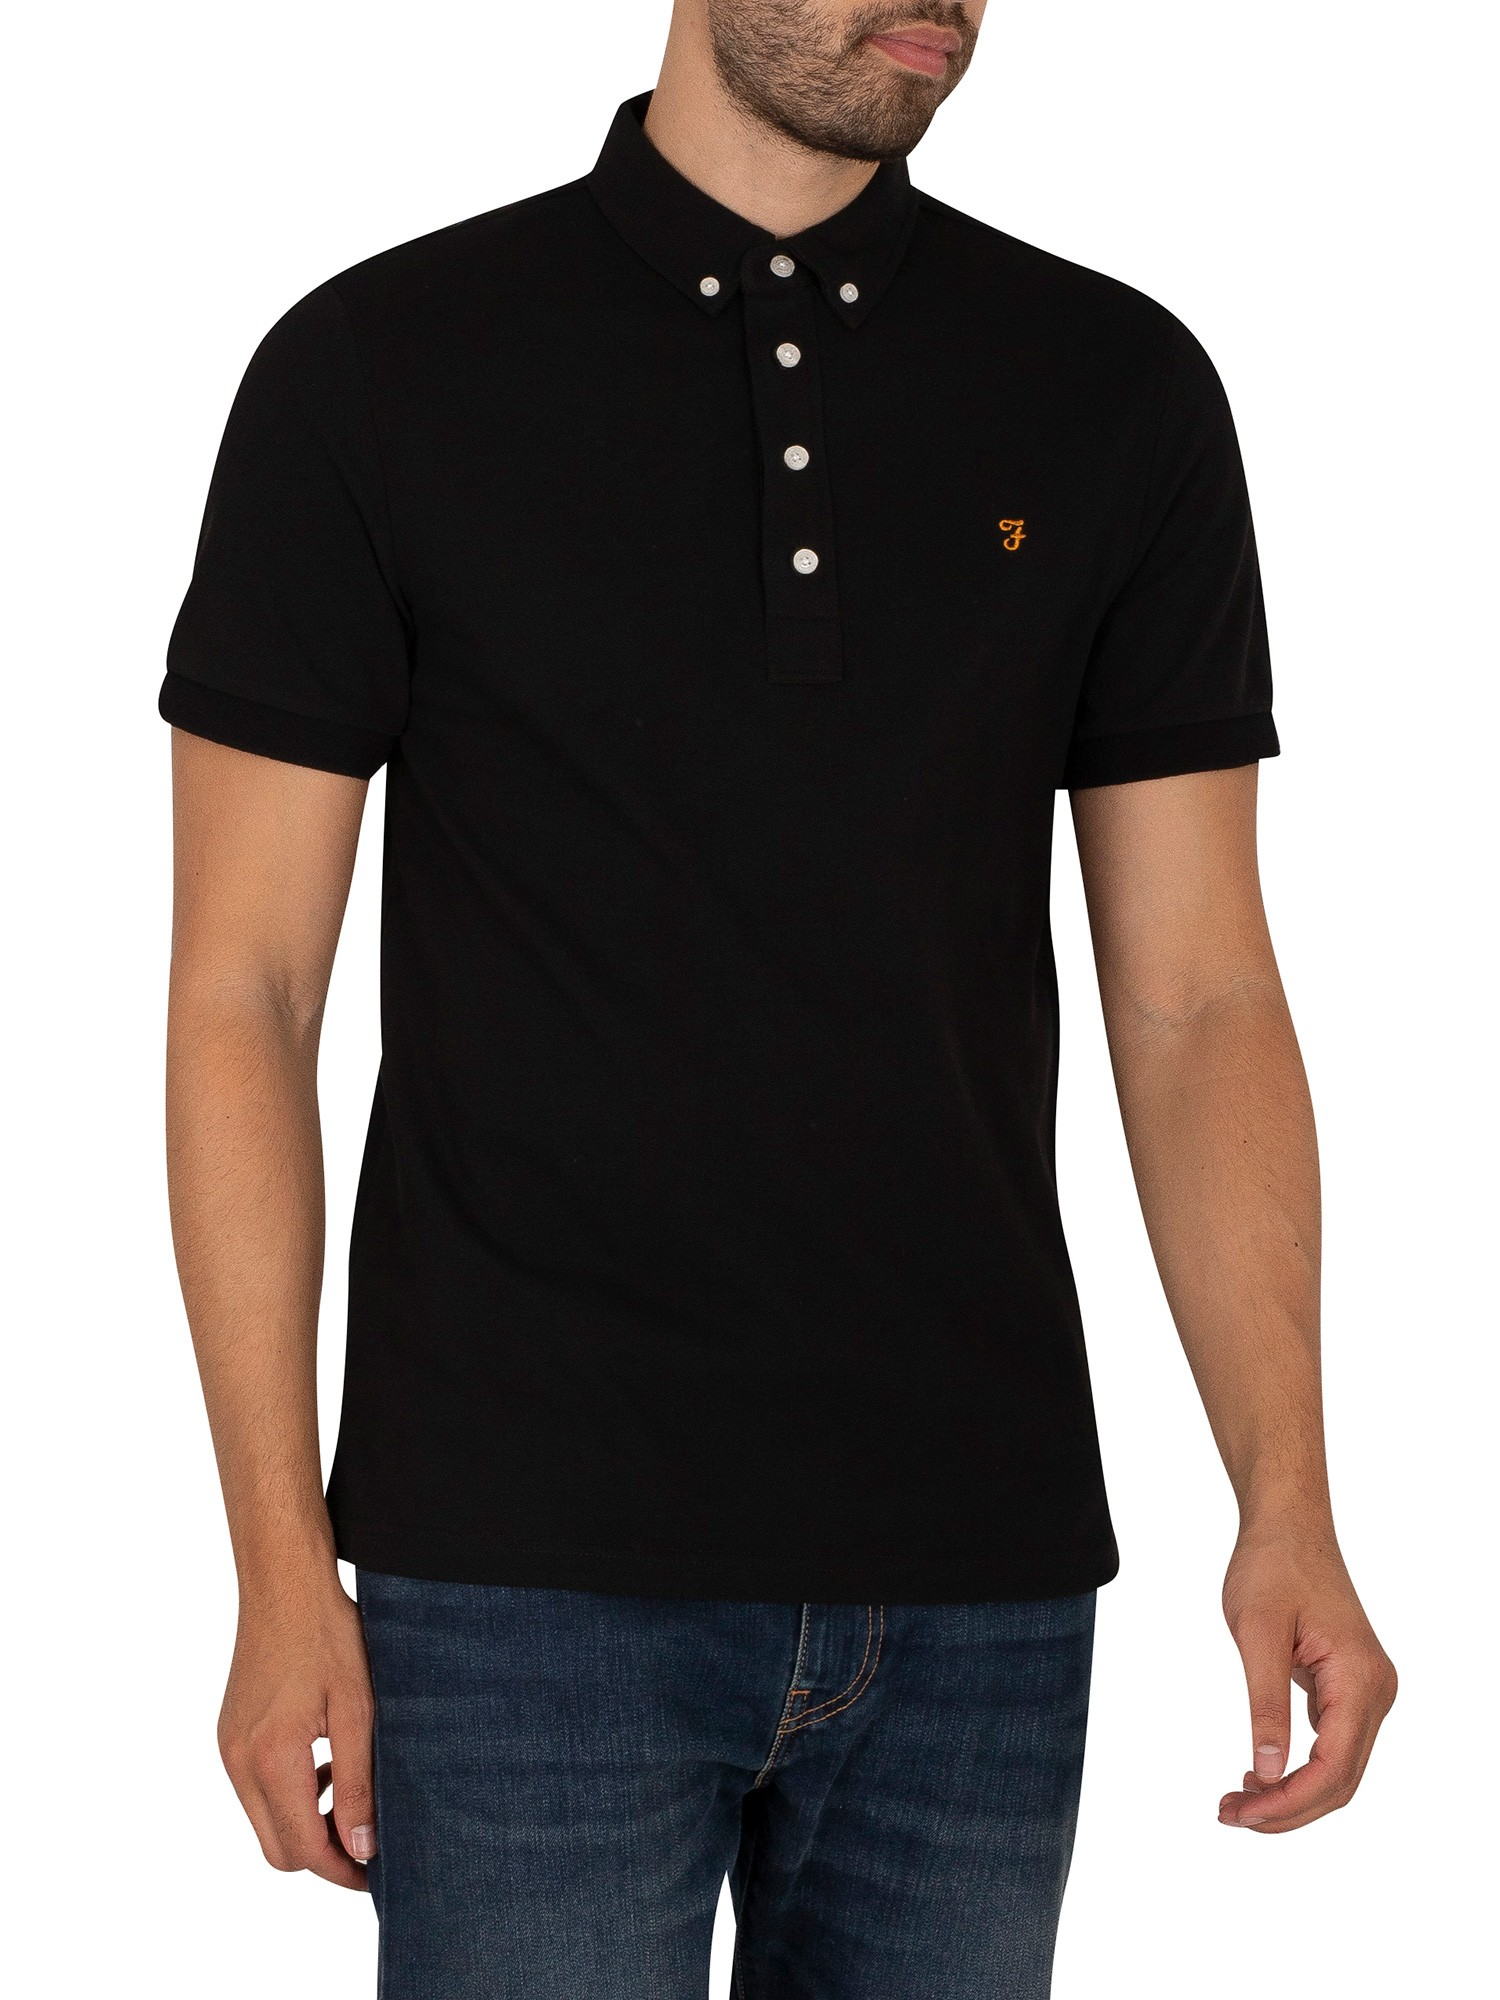 Ricky-Polo-Shirt